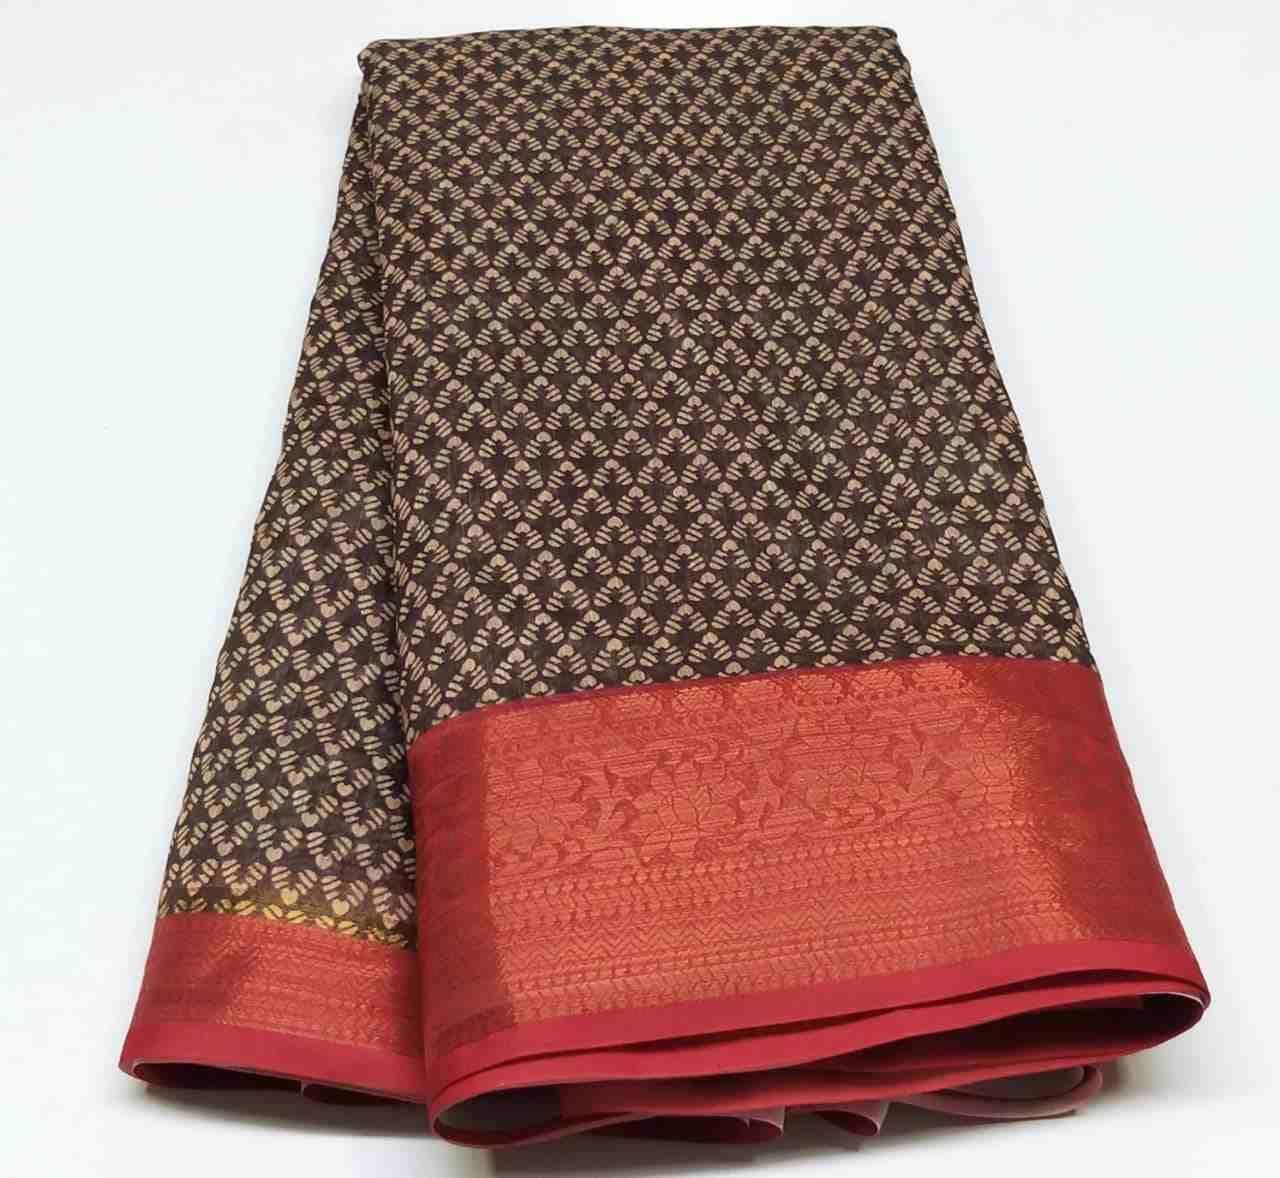 Rambha-2 Red Brown Cotton Saree